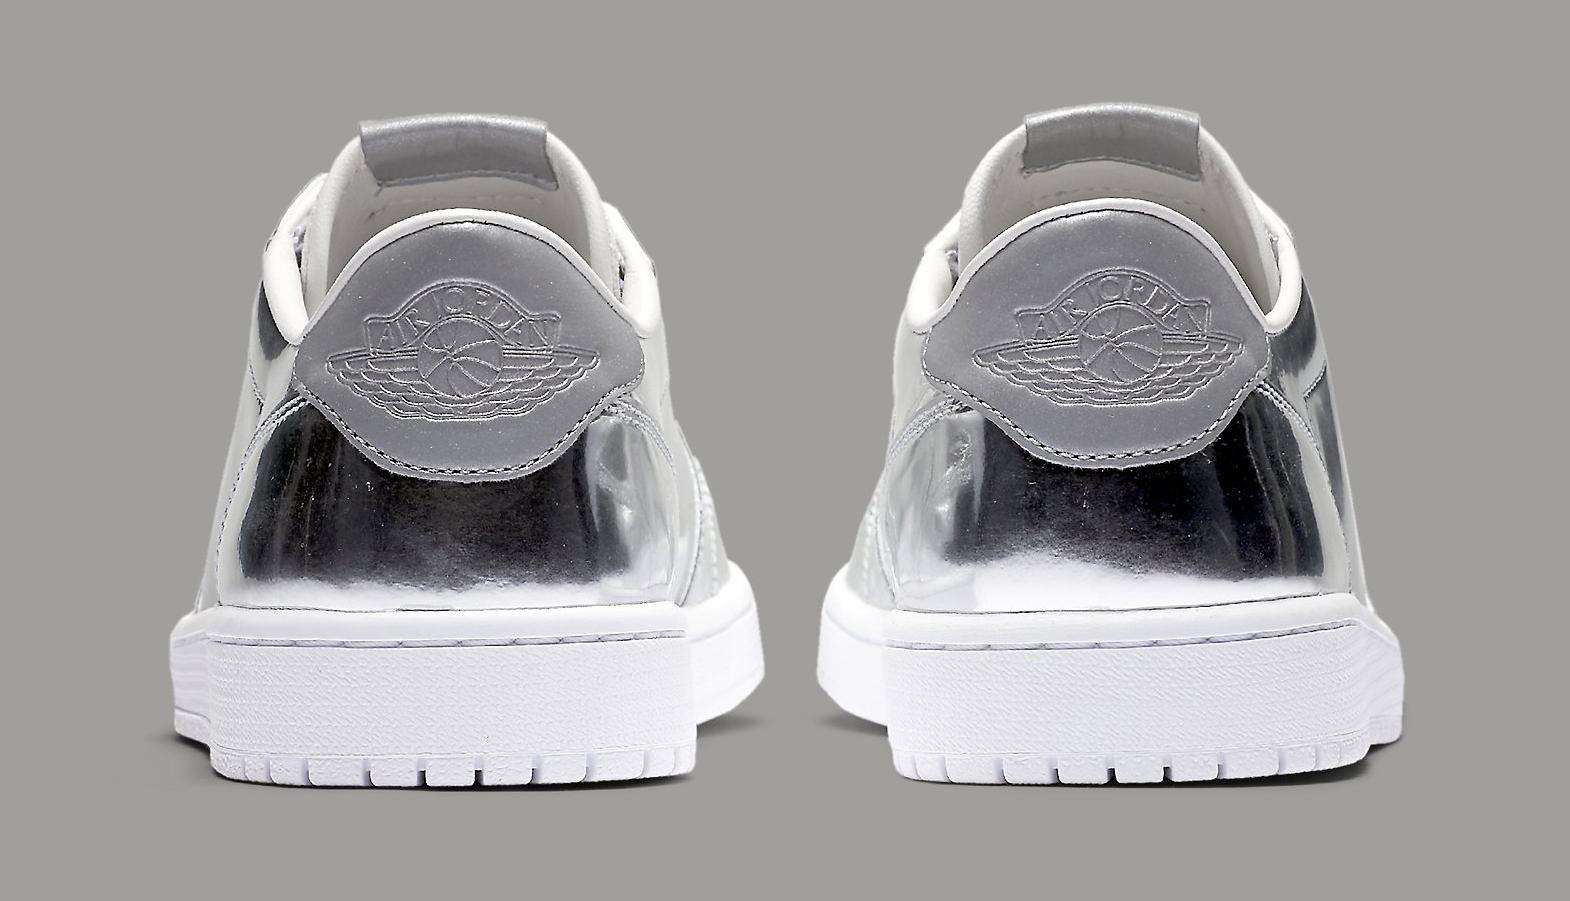 1a509e68347499 Image via Nike Silver Air Jordan 1 Low 852549-003 Heel